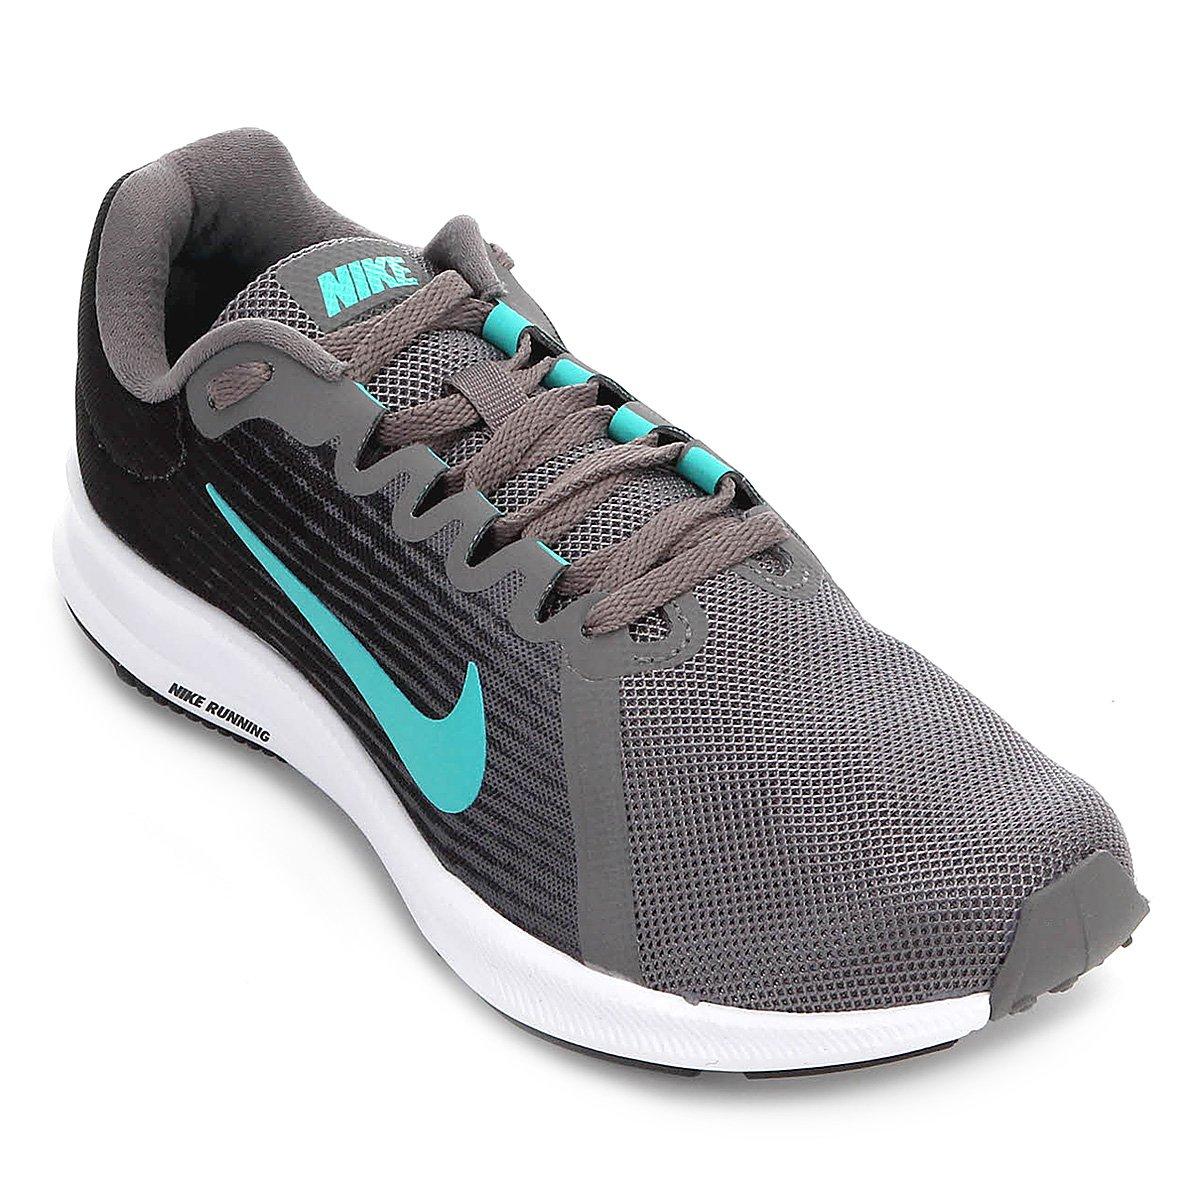 Onza habilitar Pasteles  Tênis Nike Wmns Downshifter 8 Feminino | Zattini